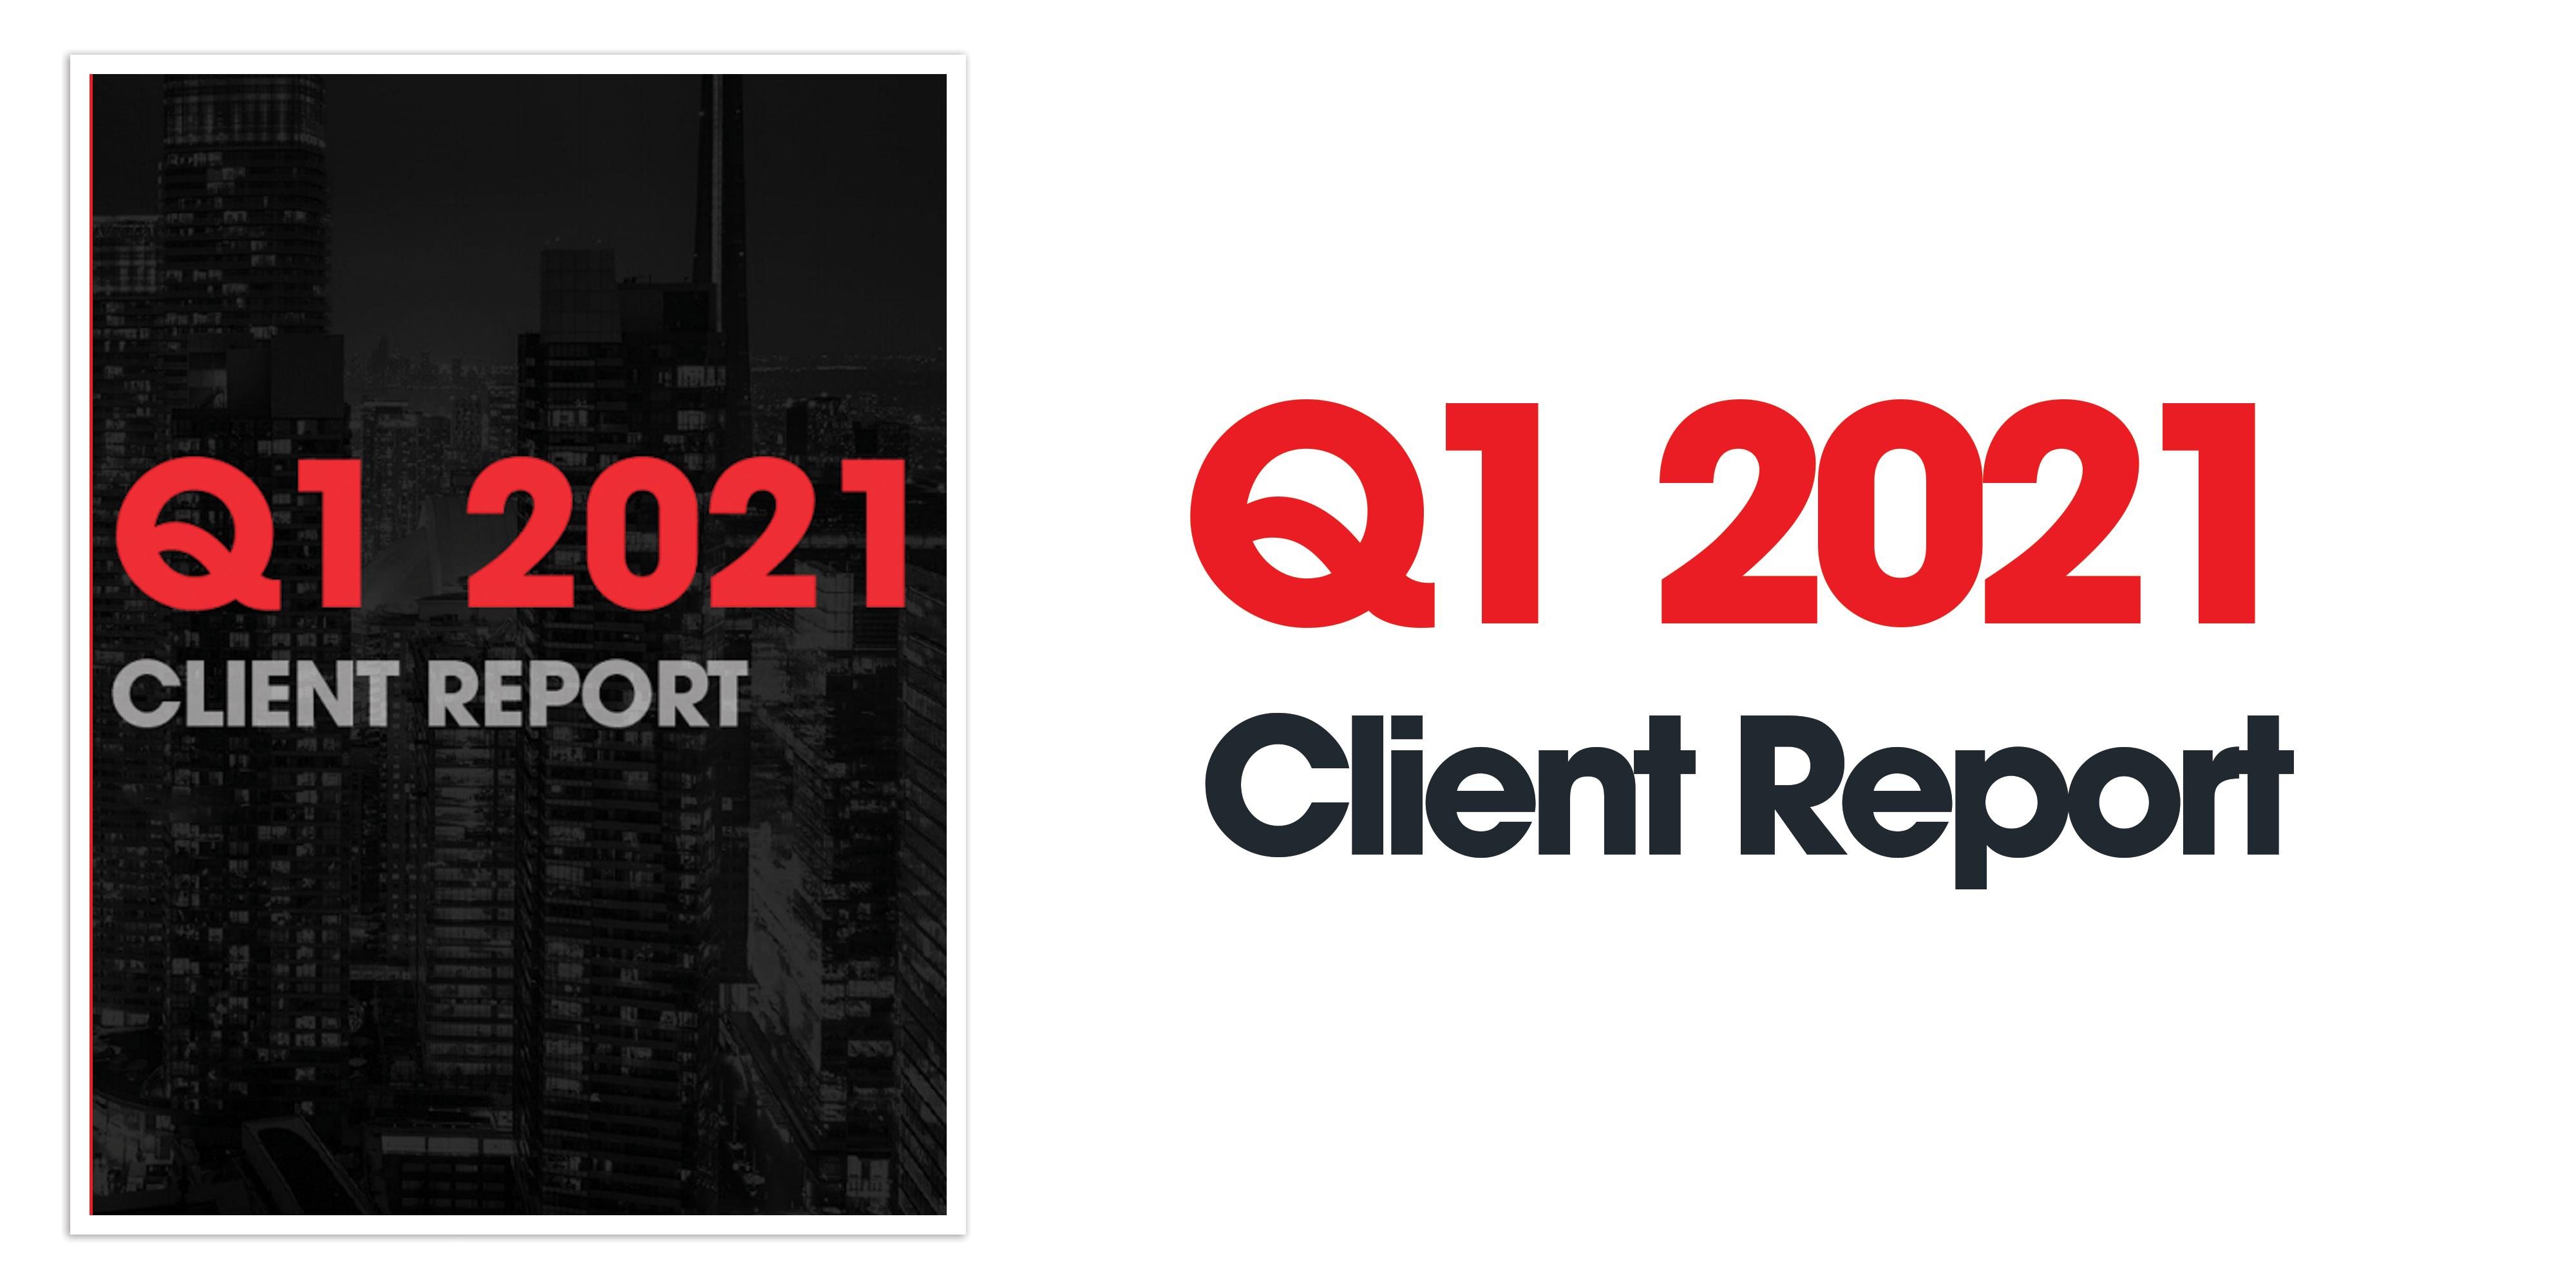 q12021